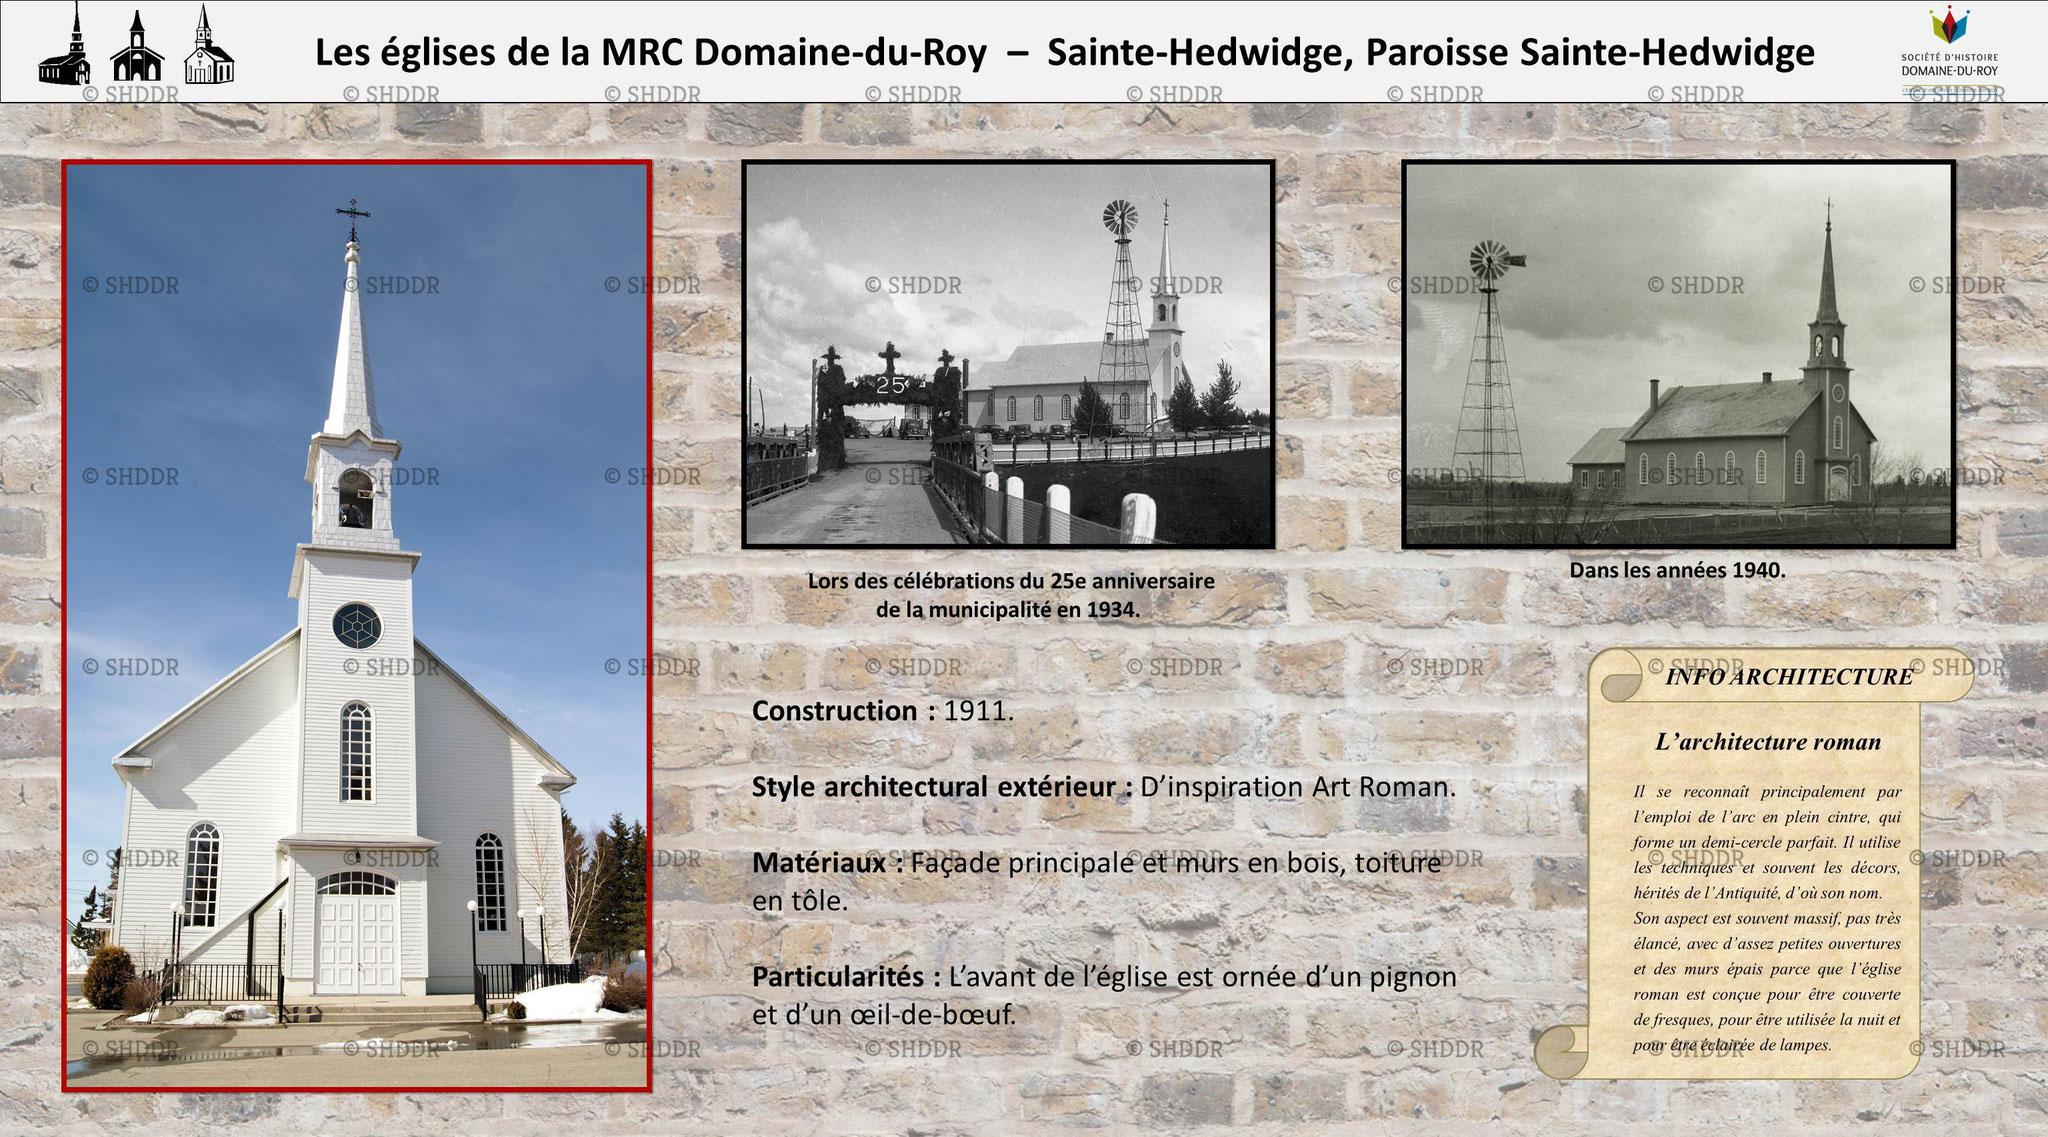 Sainte-Hedwidge - Paroisse Sainte-Hedwidge